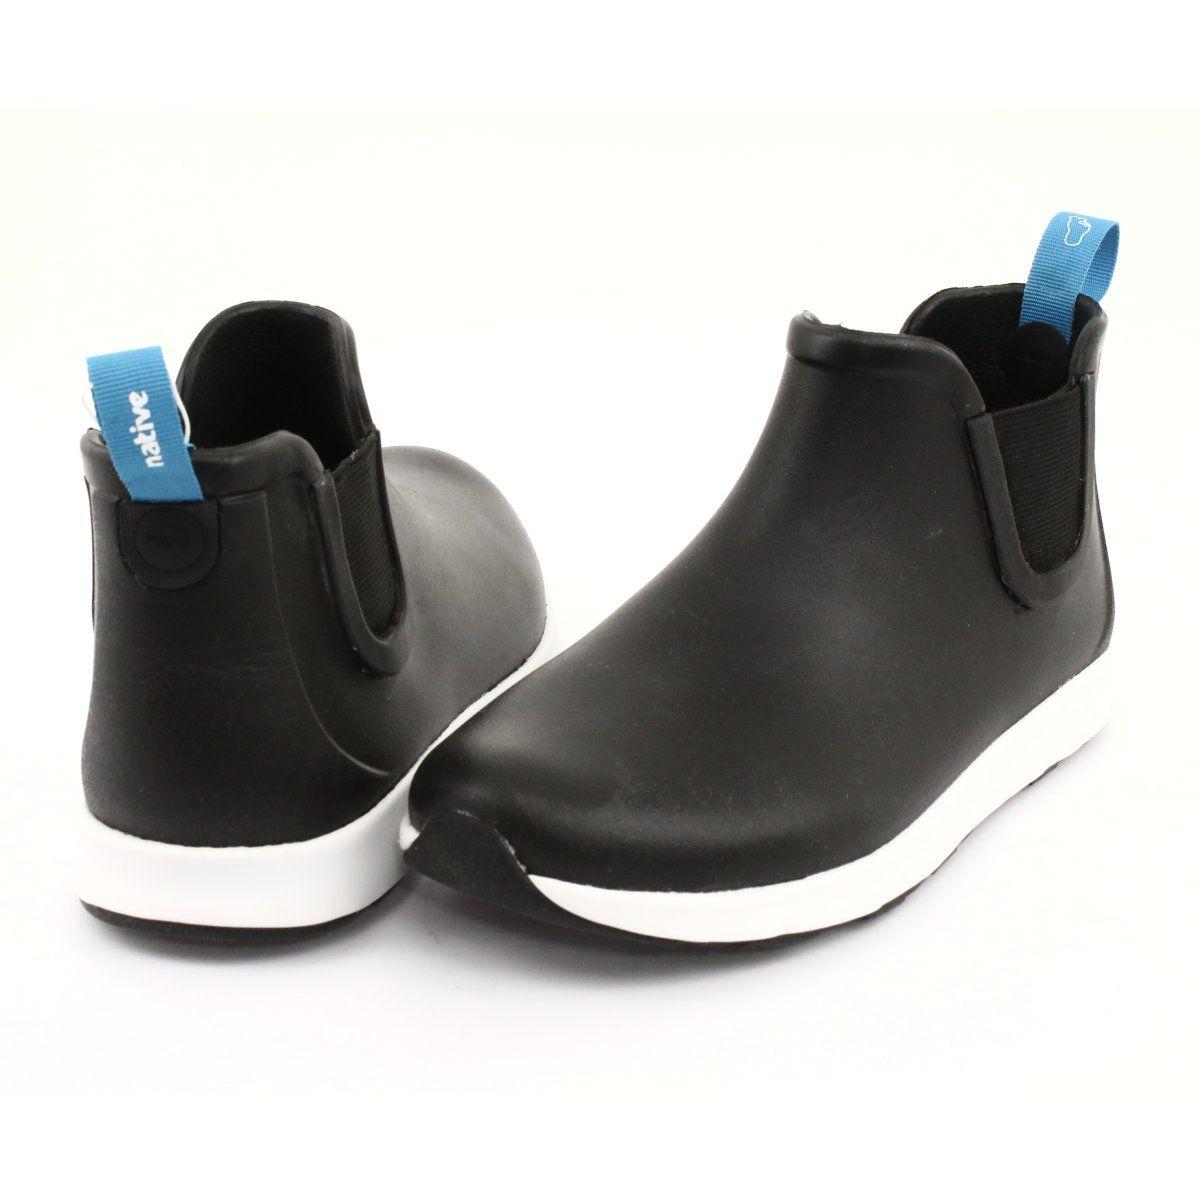 Native Ap Rain Jiffy Black Shell White Jiffy Rubber Biale Czarne Womens Wellies Boots Black